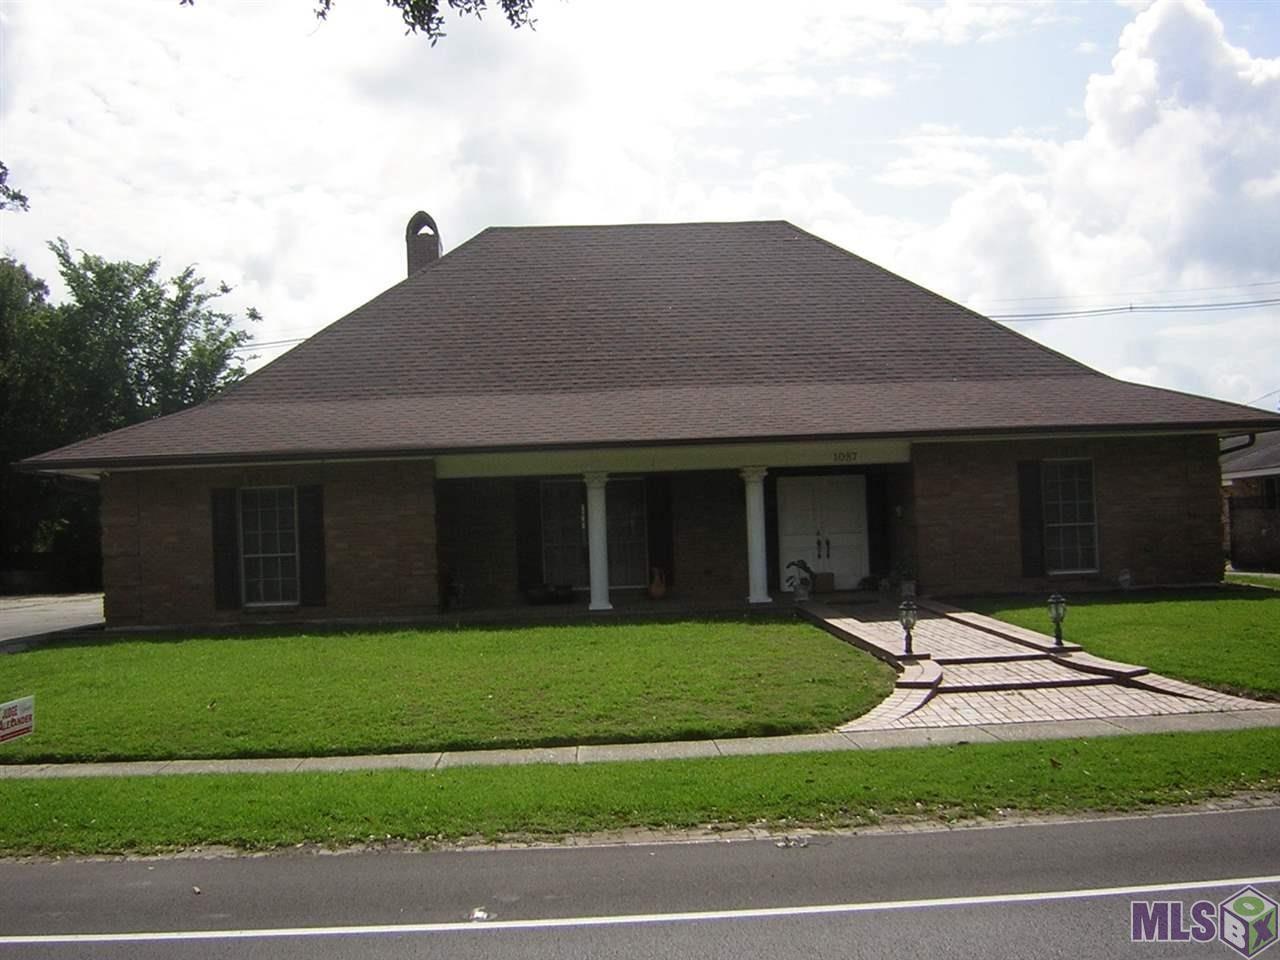 1087 S SHERWOOD FOREST BLVD, Baton Rouge, LA 70815 - MLS#: 2020008457